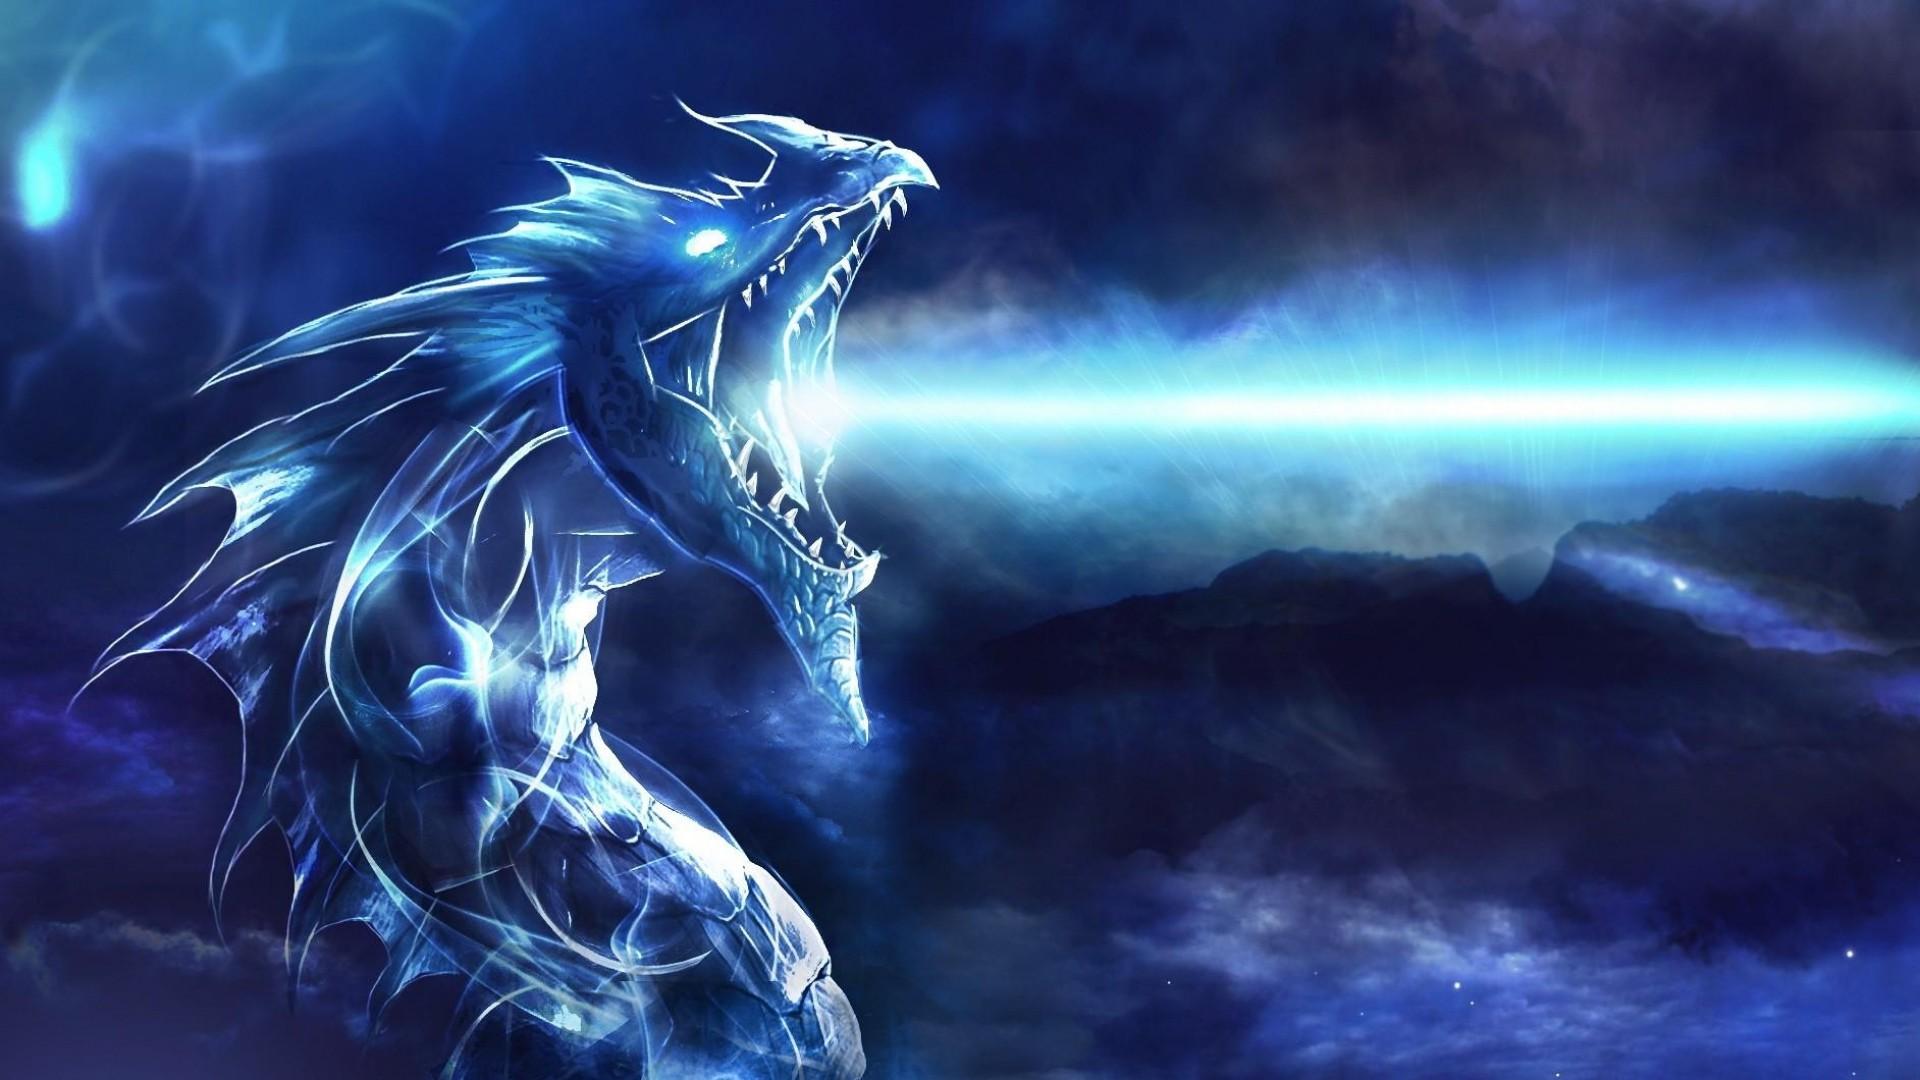 … Background Full HD 1080p. Wallpaper dragon, mouth, night,  light